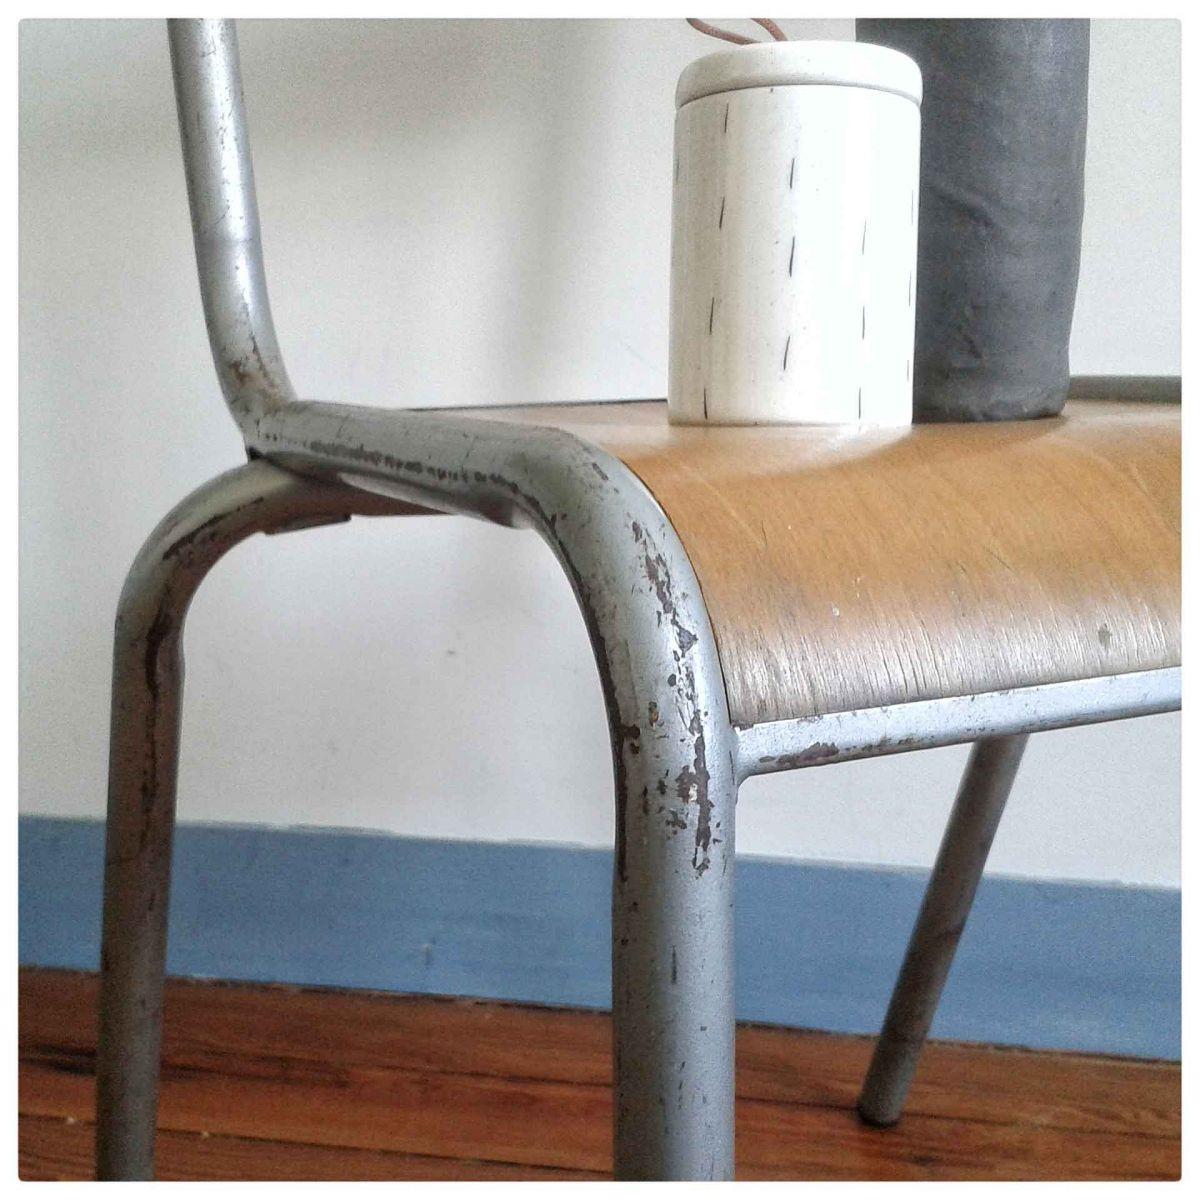 chaise d 39 cole mullca 510 luckyfind. Black Bedroom Furniture Sets. Home Design Ideas